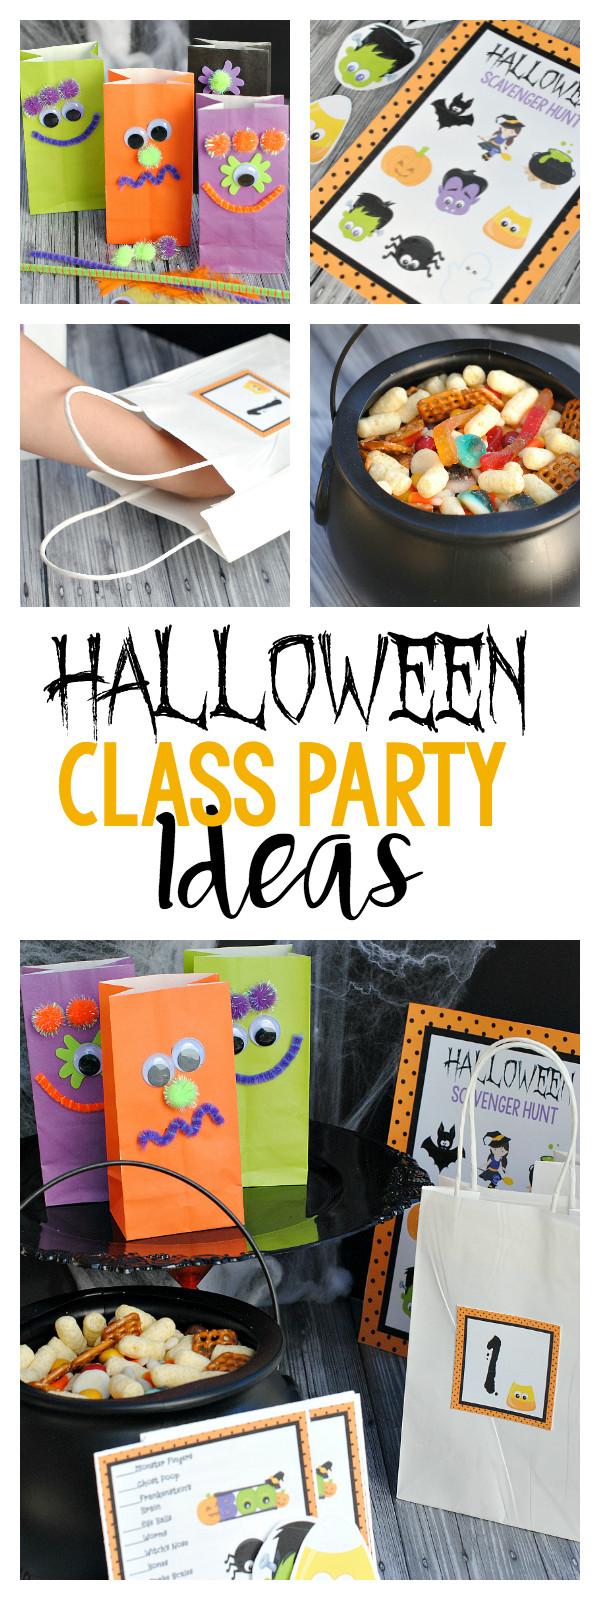 Halloween School Party Ideas  Easy & Fun Halloween School Party Ideas – Fun Squared